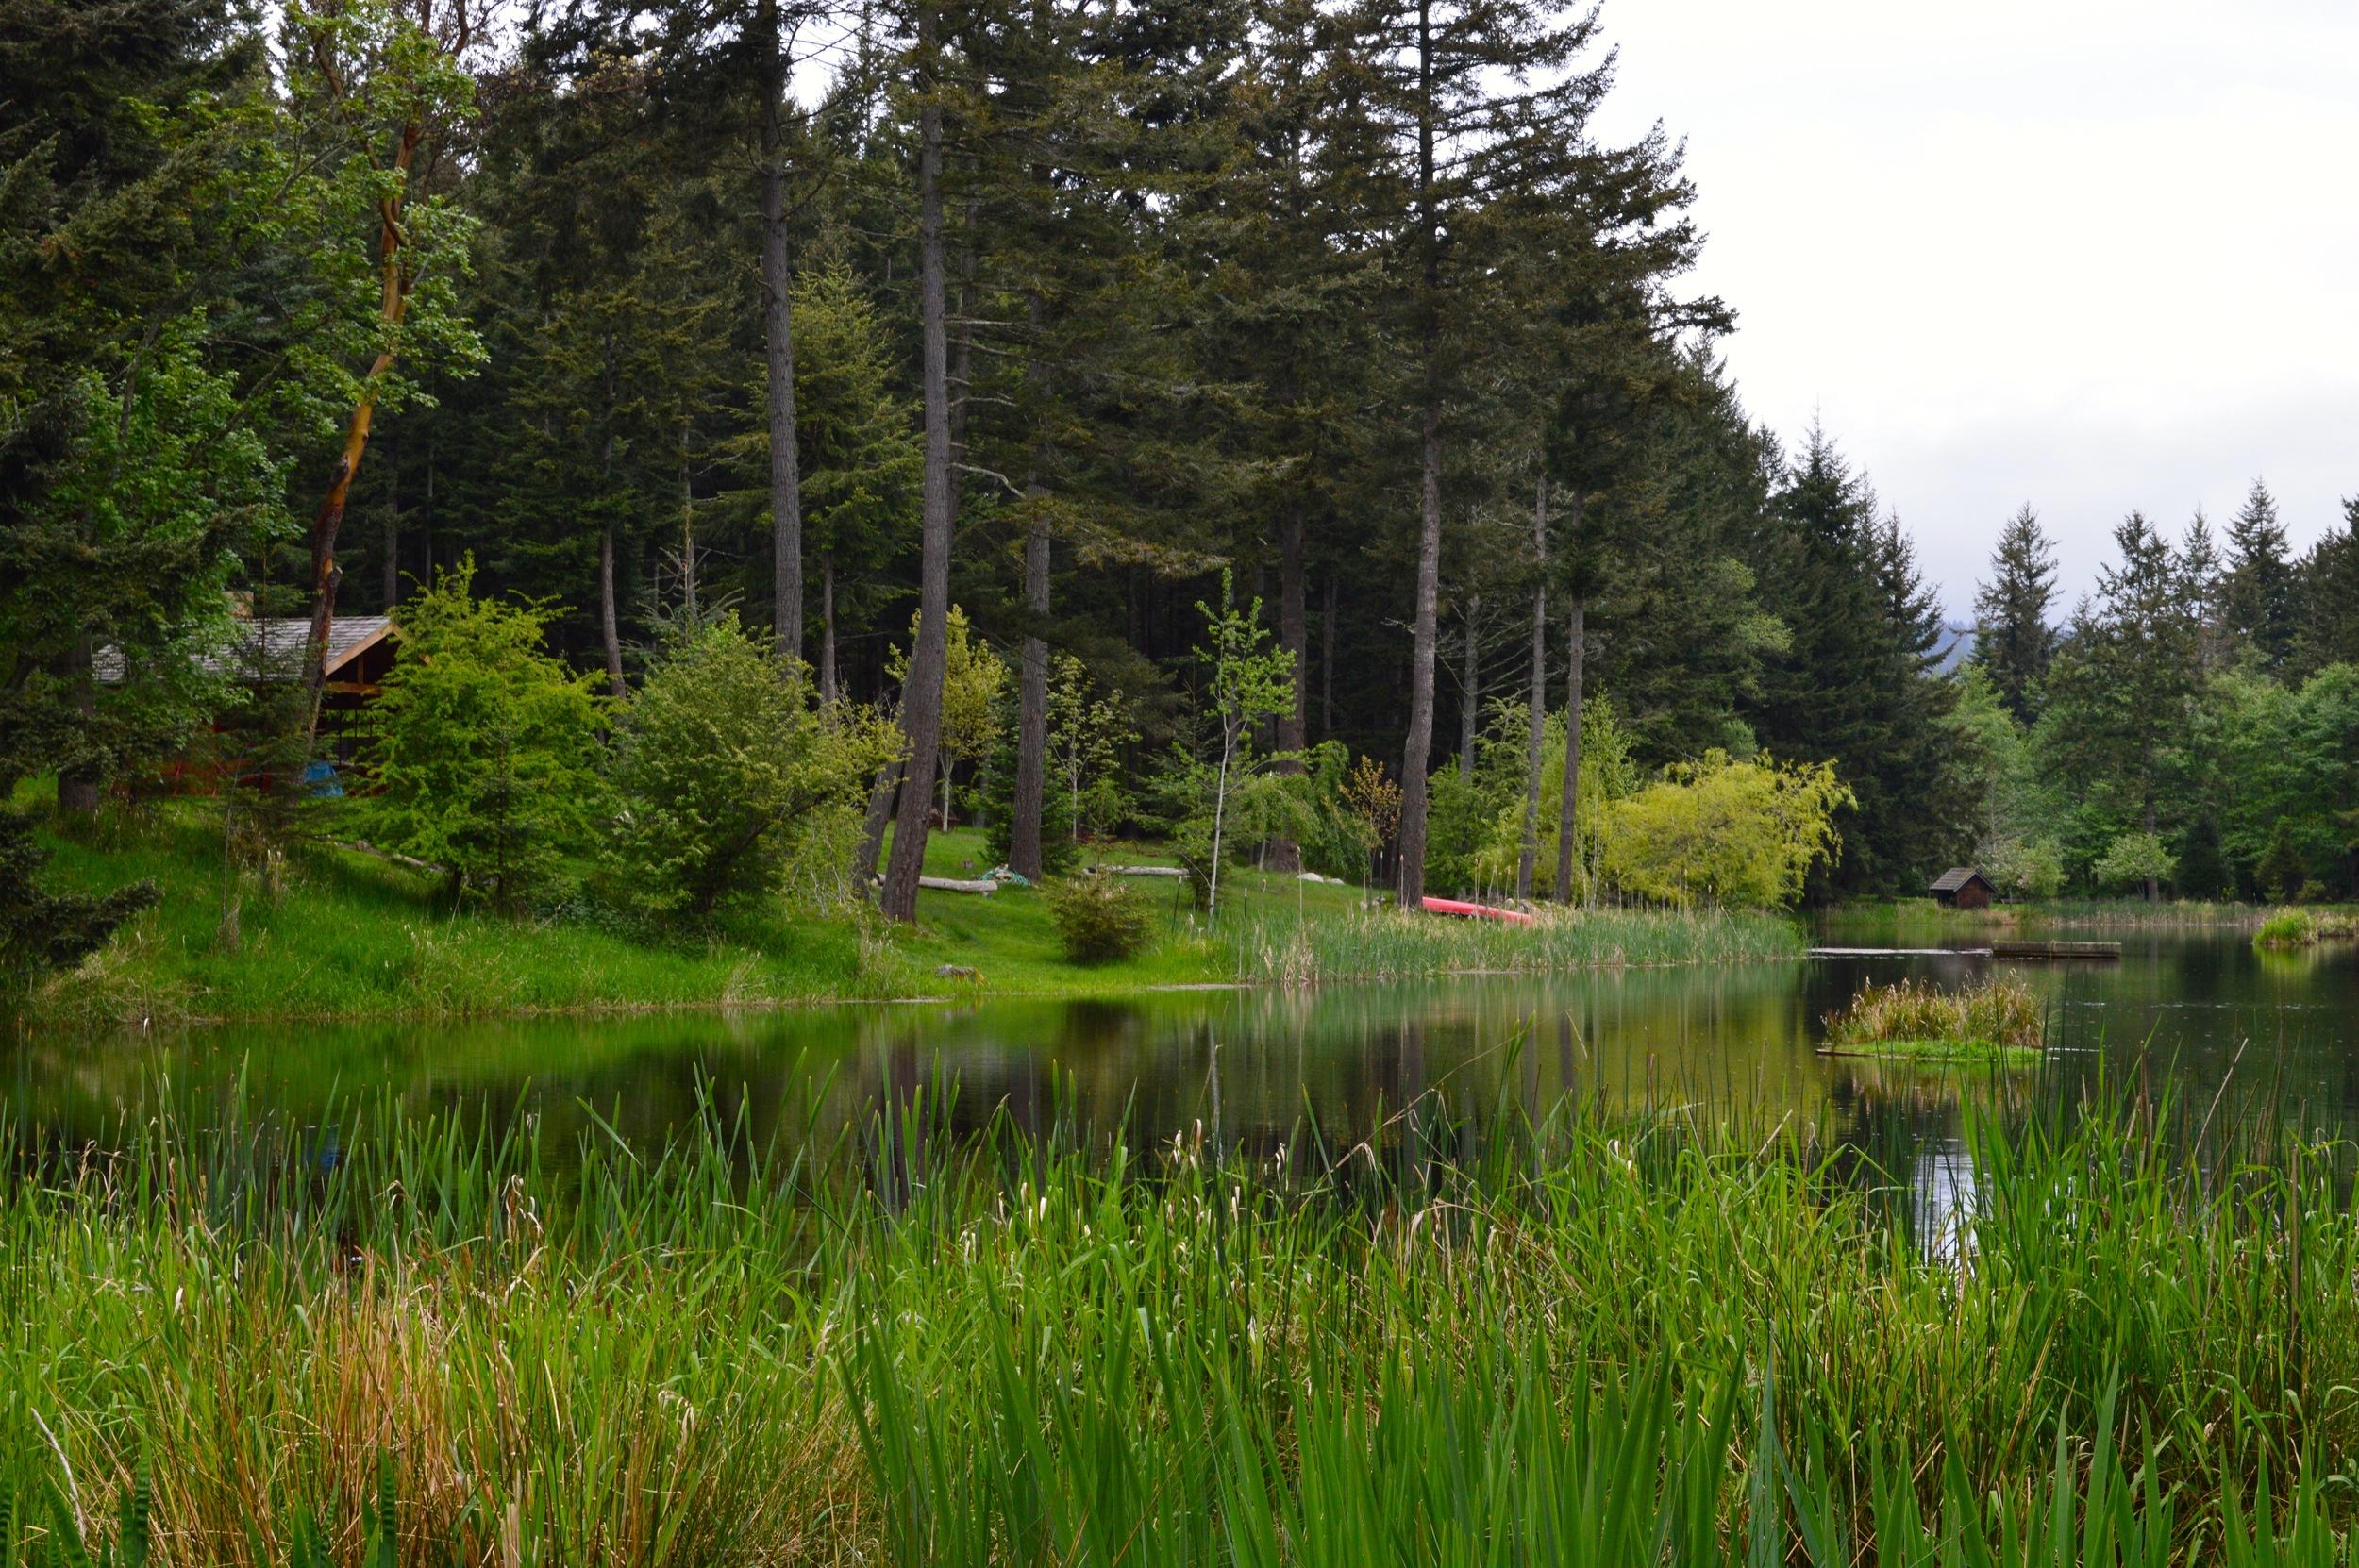 Lake, Cabin, Canoe - what else do you need?